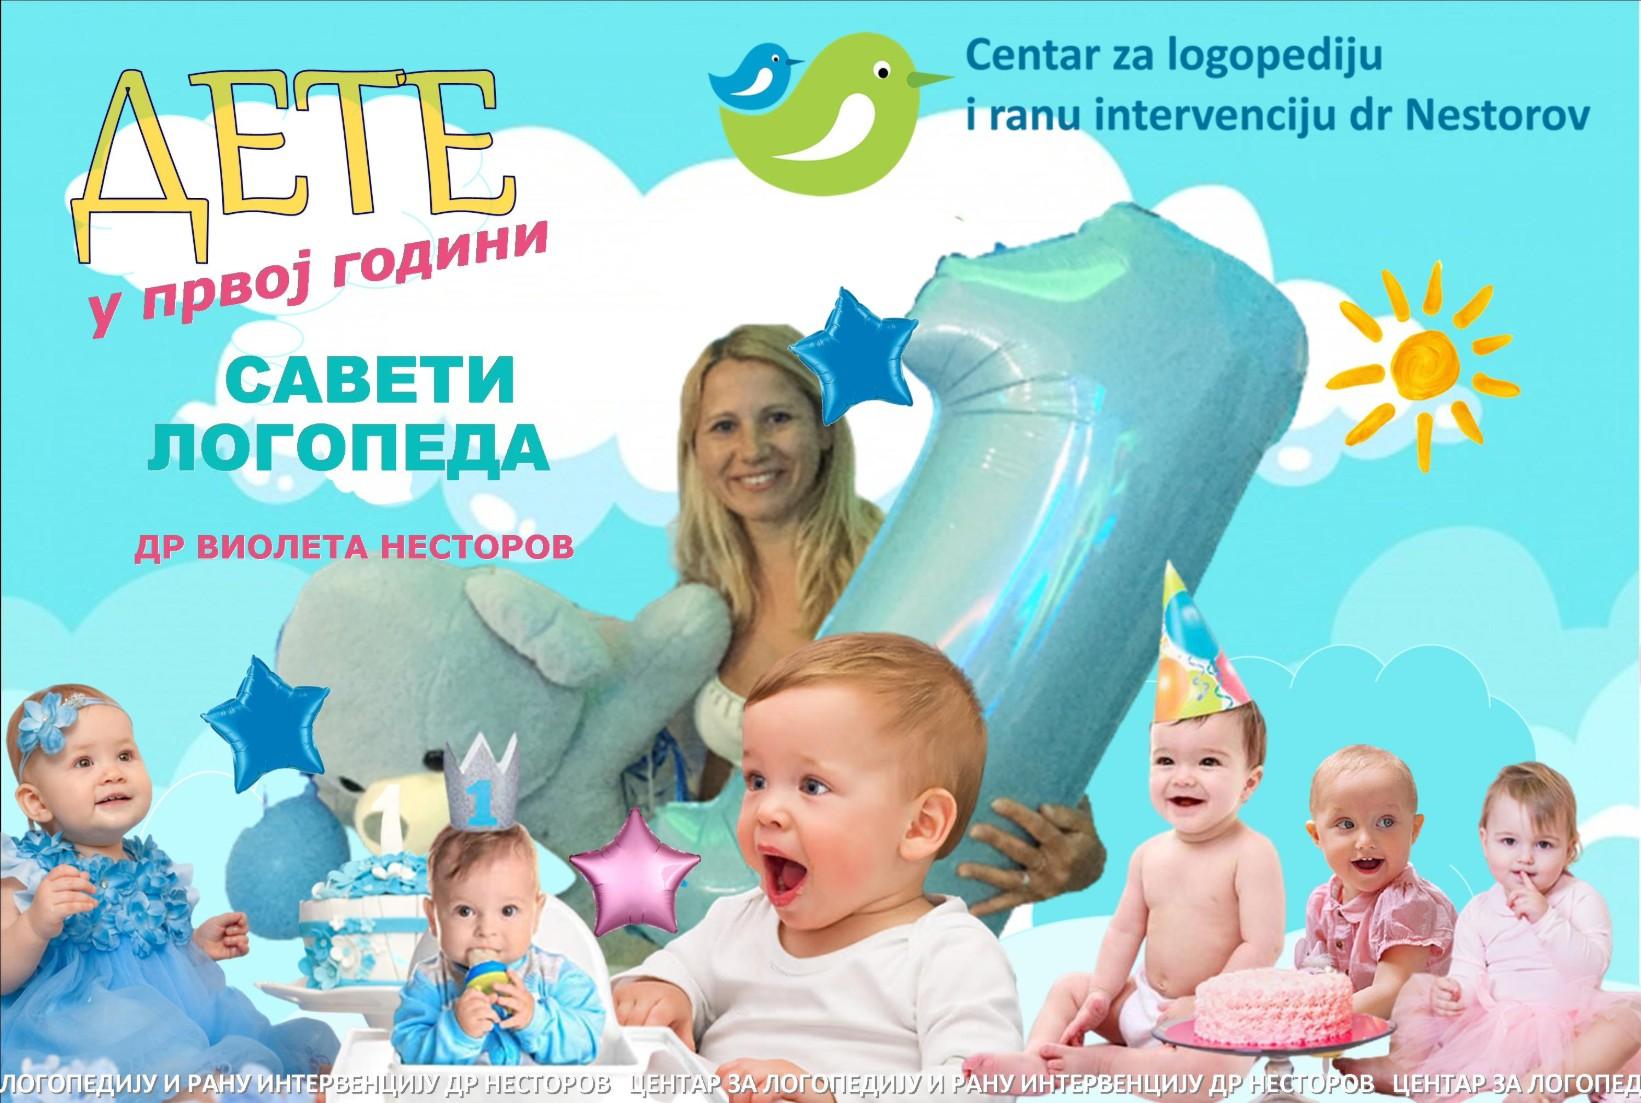 dr Violeta Nestorov logoped, razvoj dece u prvoj godini